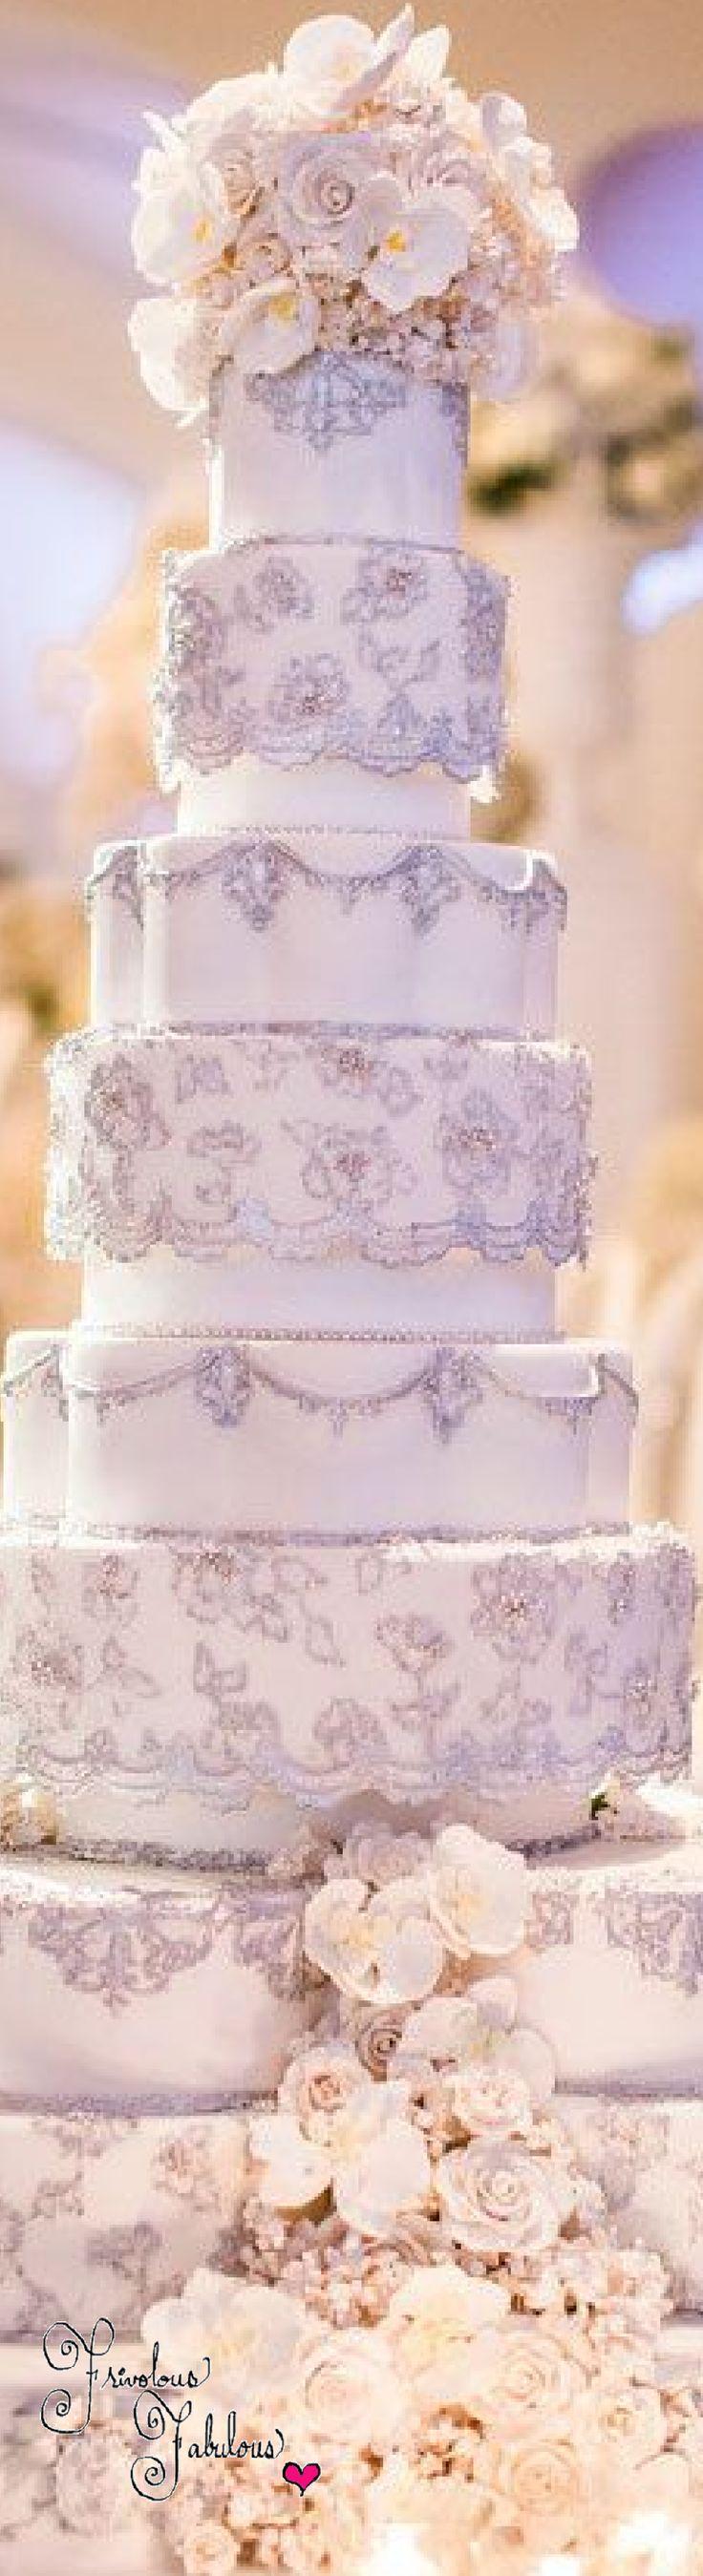 Frivolous Fabulous - Lavender Cake By Wed Luxe